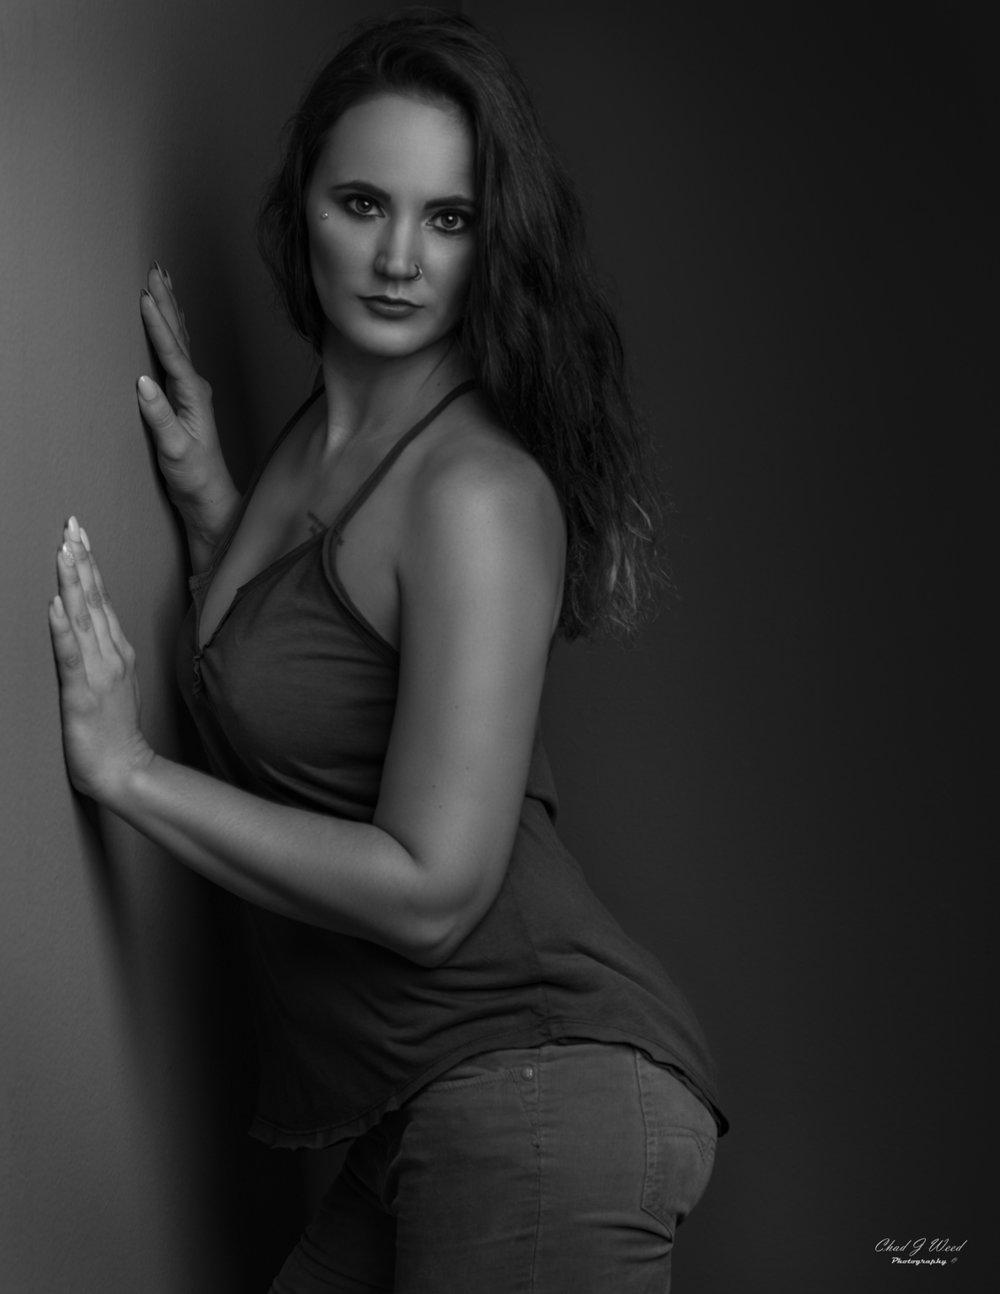 Erica Fashion Portrait by Mesa Arizona Portrait Photographer Chad Weed